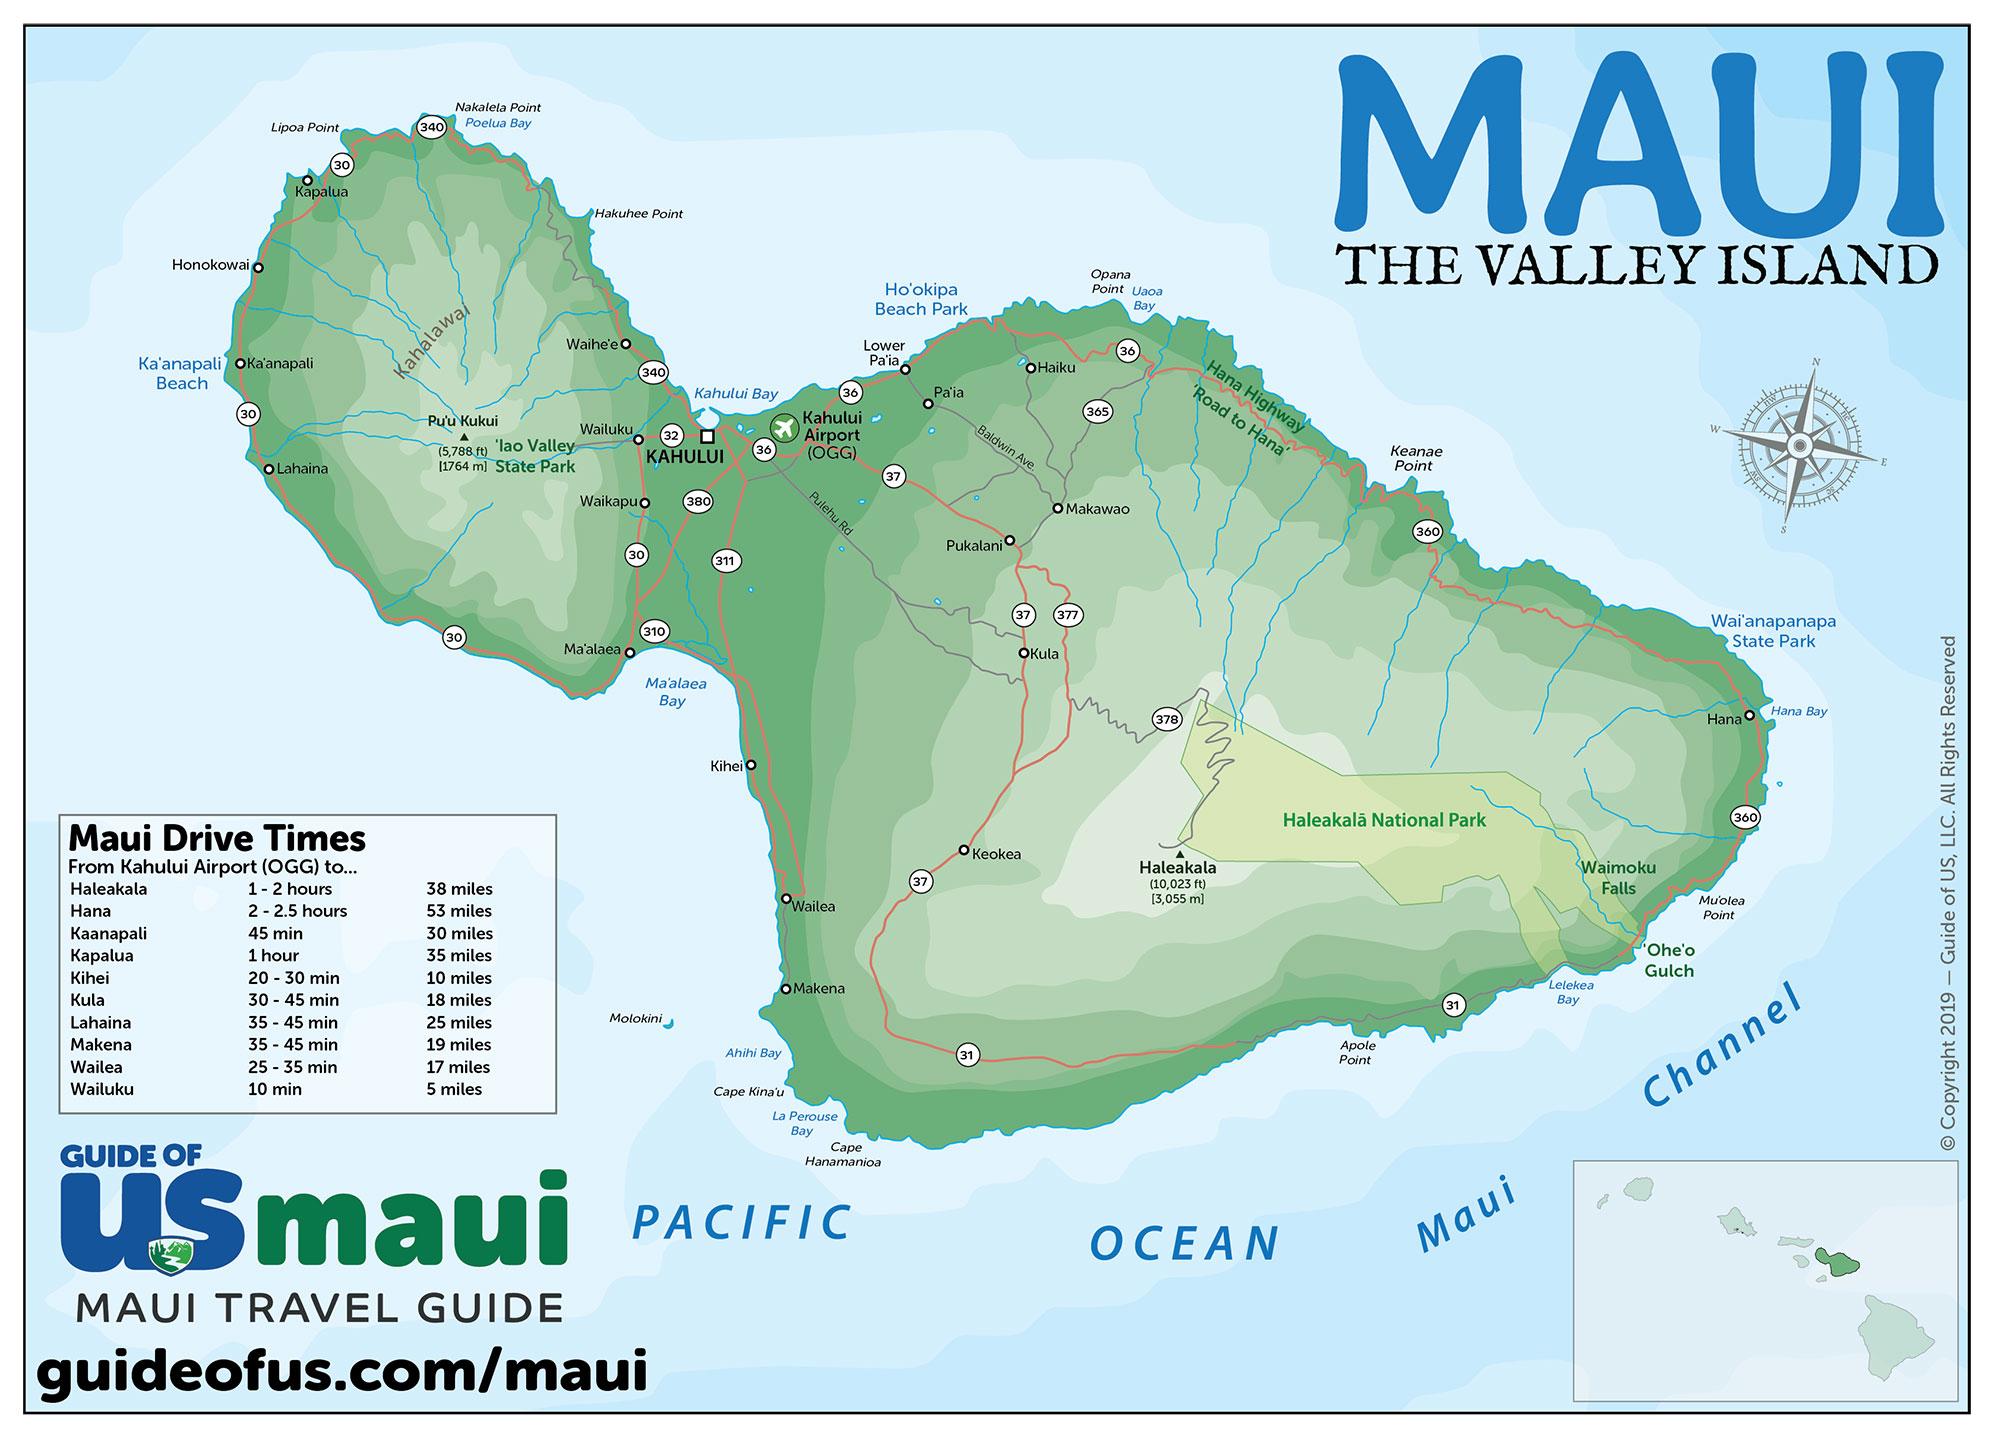 image regarding Maui Map Printable identify Maui Hawaii Maps - Push Street Map